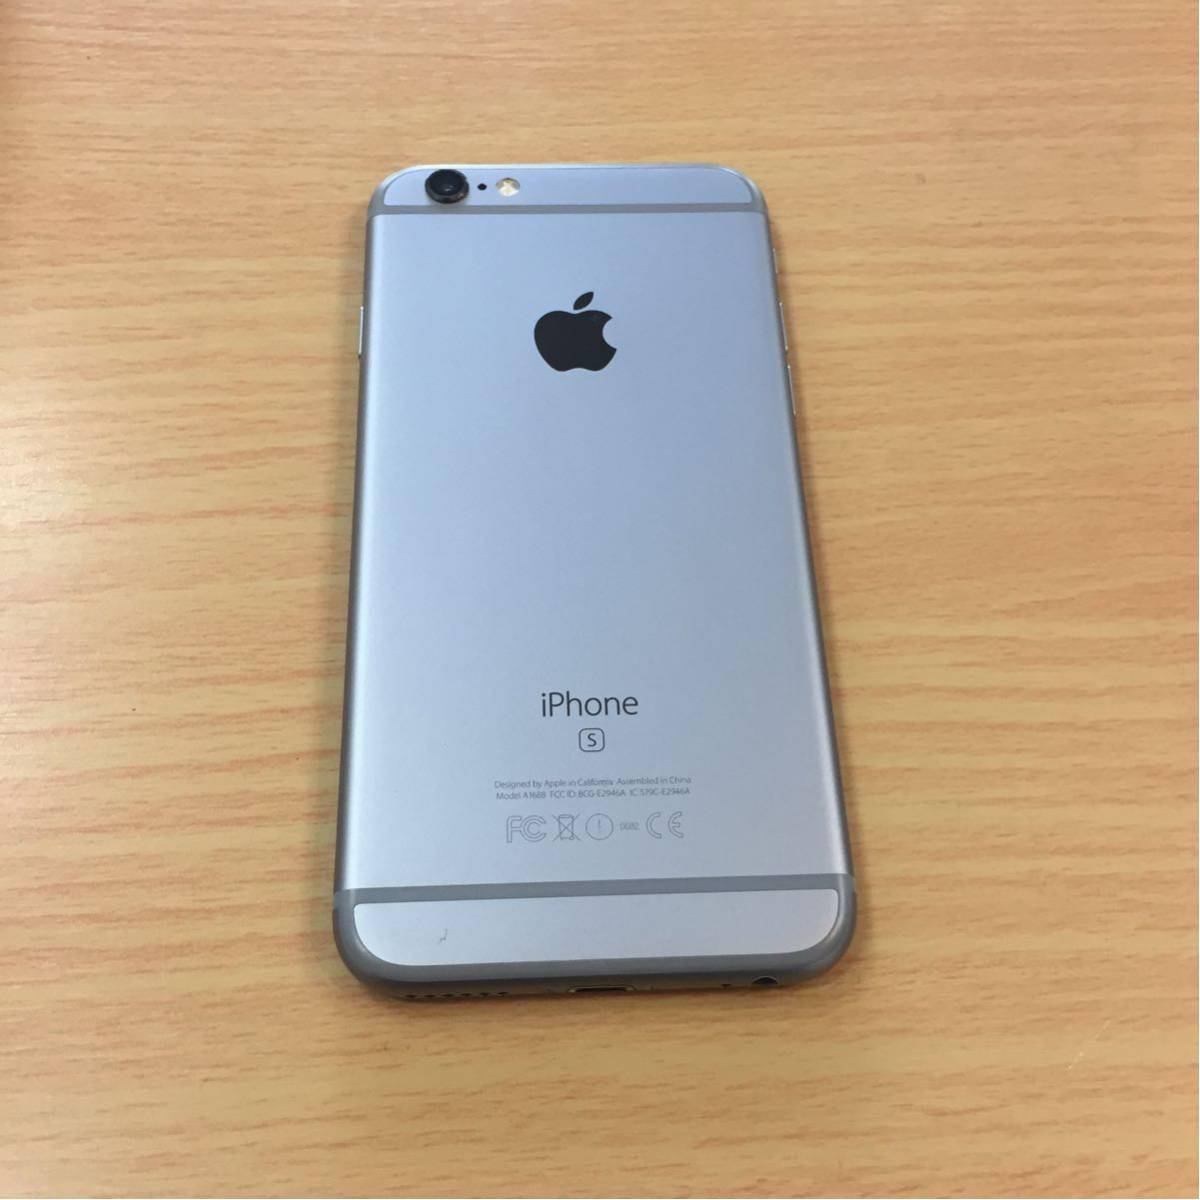 au iPhone6s 128GB グレー 10.3.3 MKQT2J/A 制限○_画像3